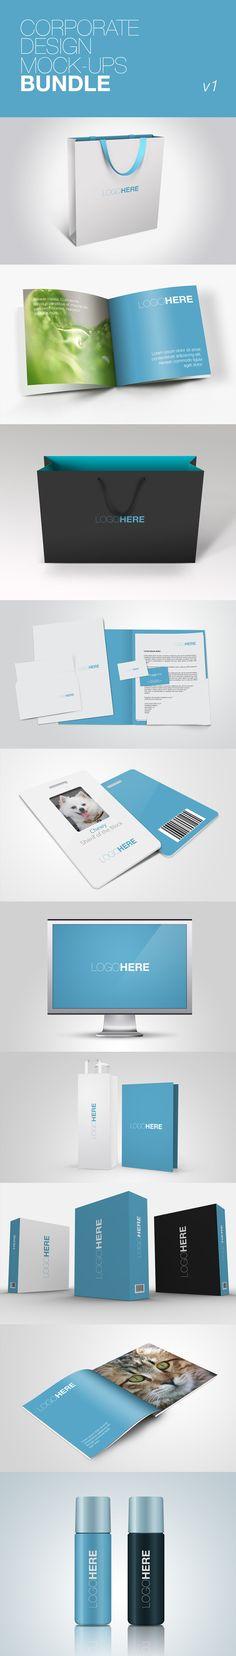 #corporate #identity #Branding Presentation PSD Templates azul Mockup